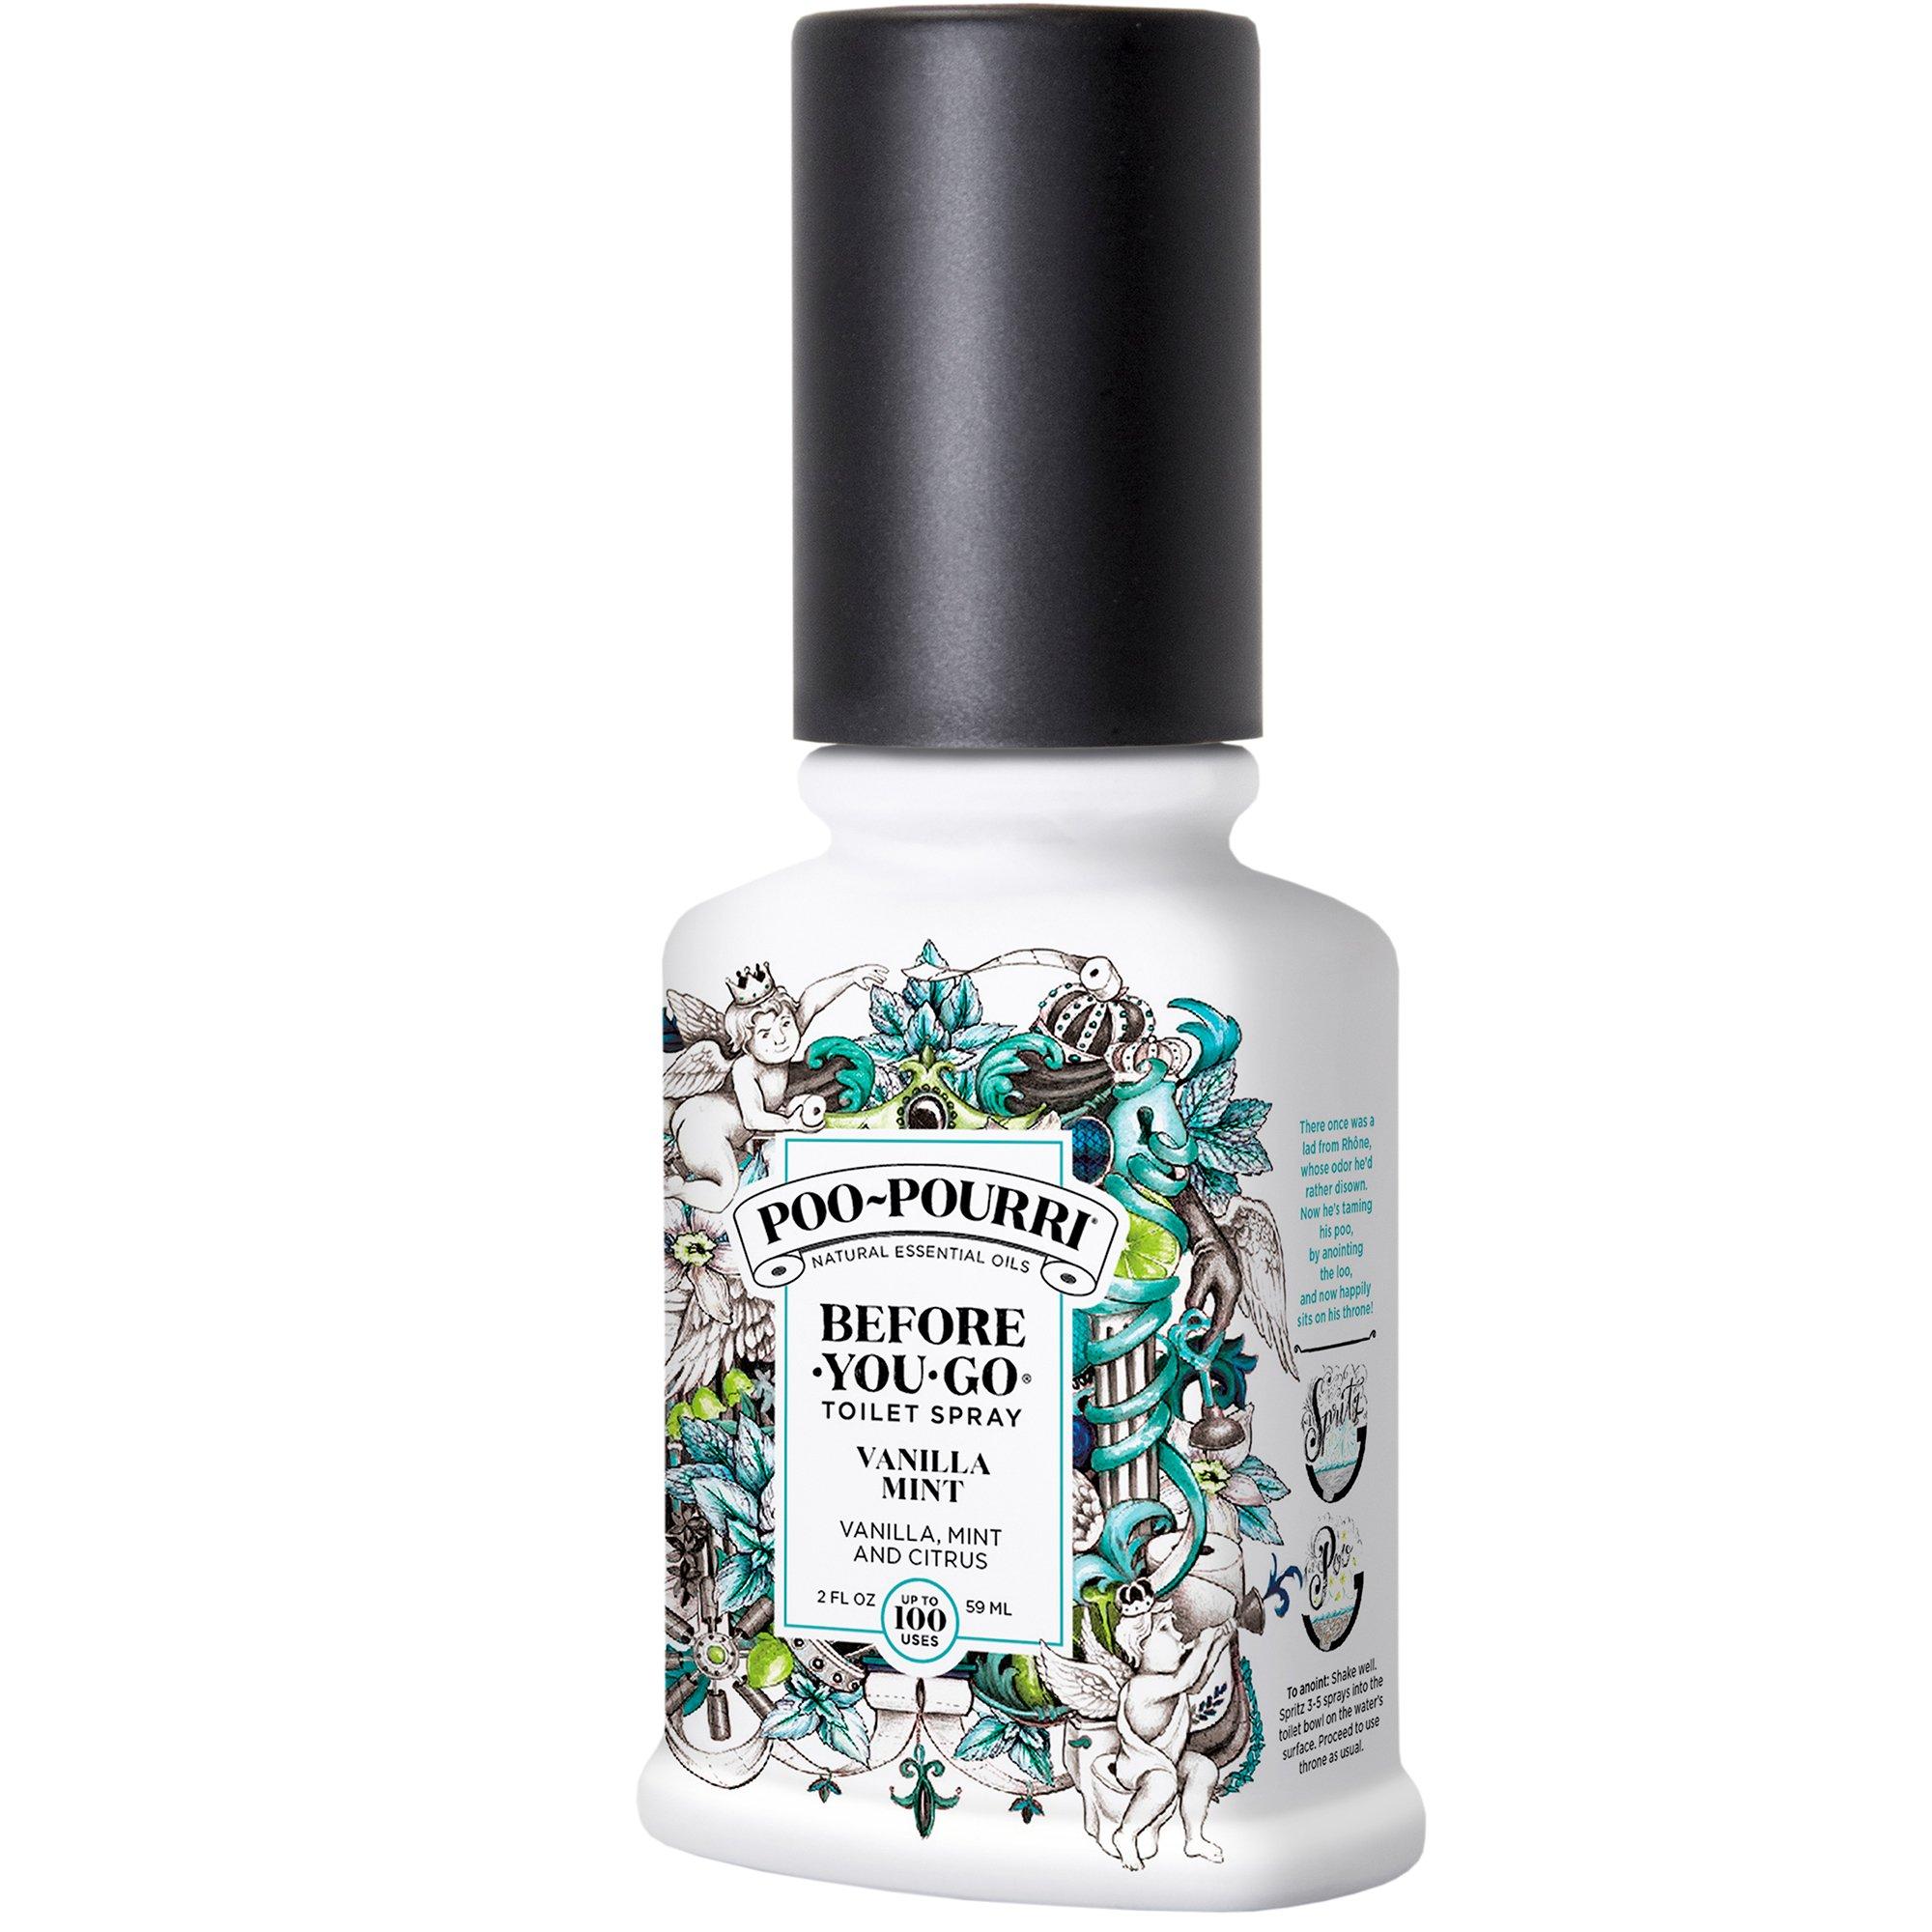 Poo-Pourri Before-You-Go Toilet Spray, Vanilla Mint Scent, 2 Fl Oz, 2 Fl Oz